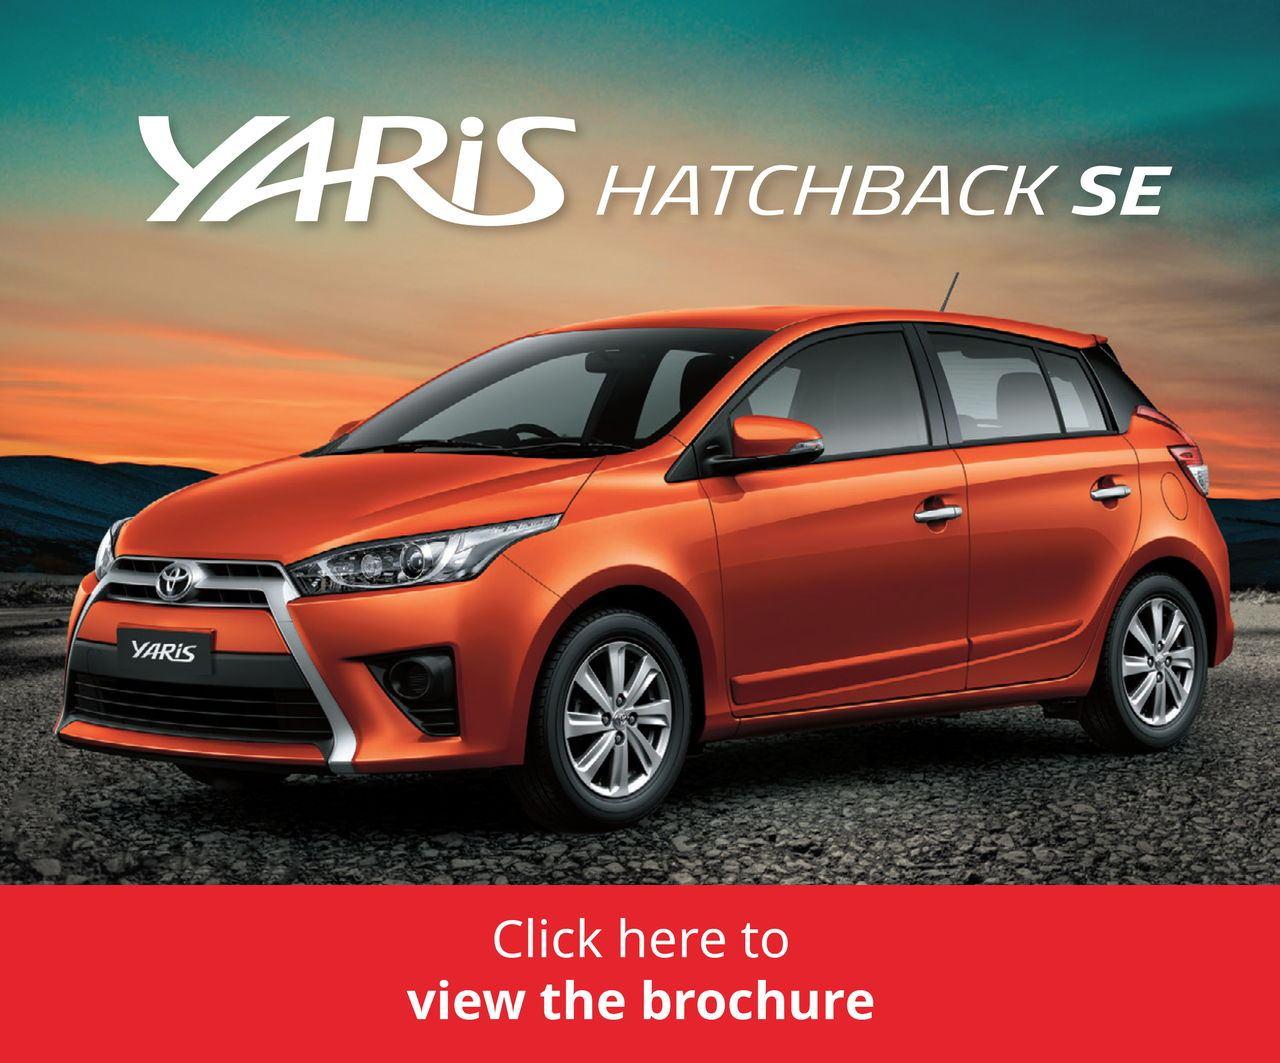 Download the Yaris HB brochure here